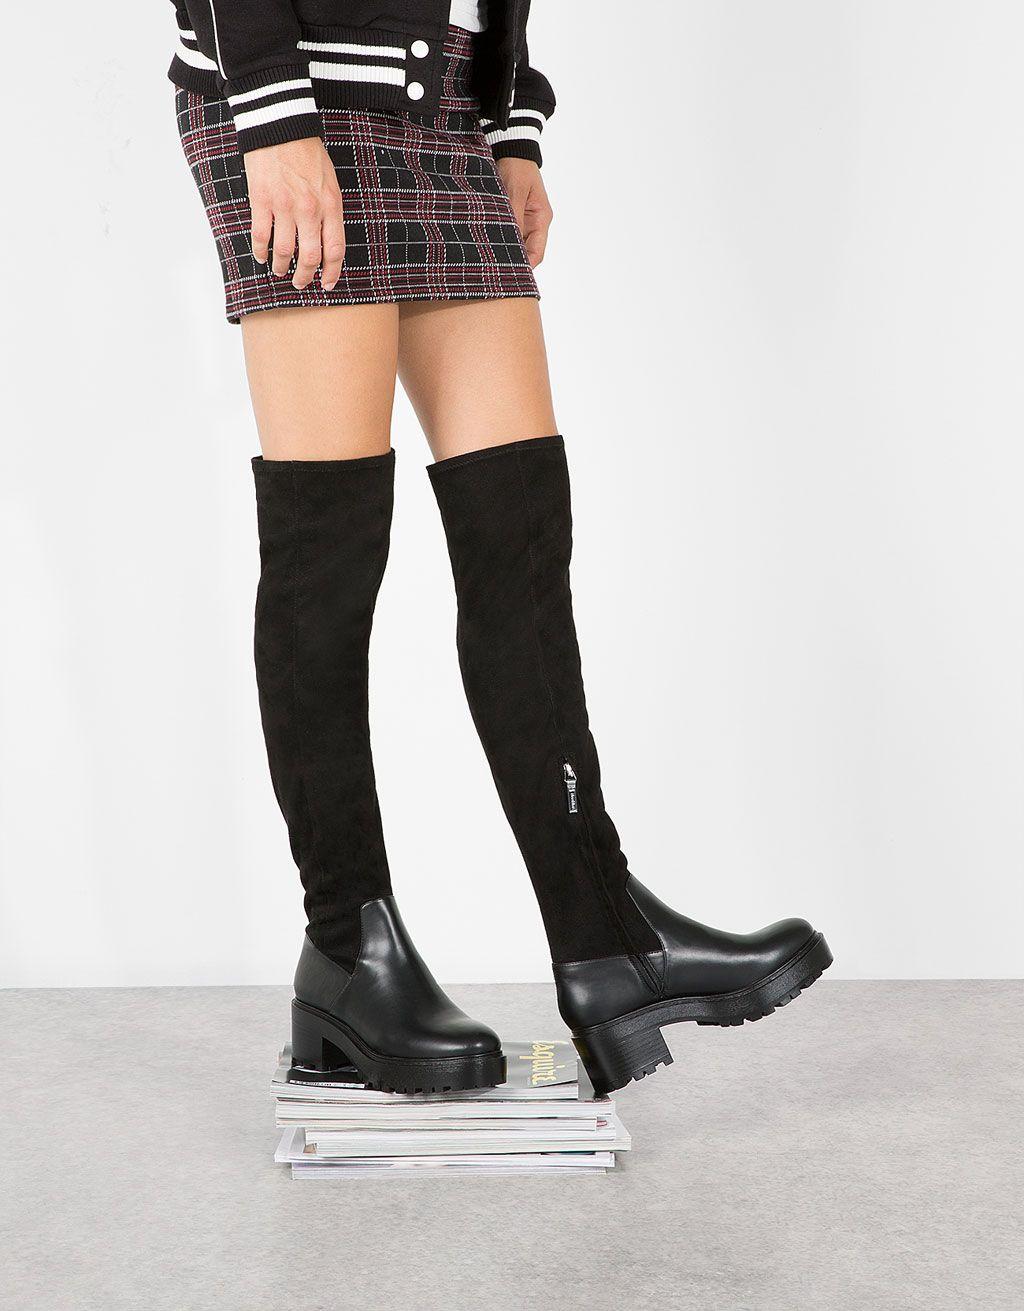 bershka france - bottes hautes bi-matière talon moyen | mode